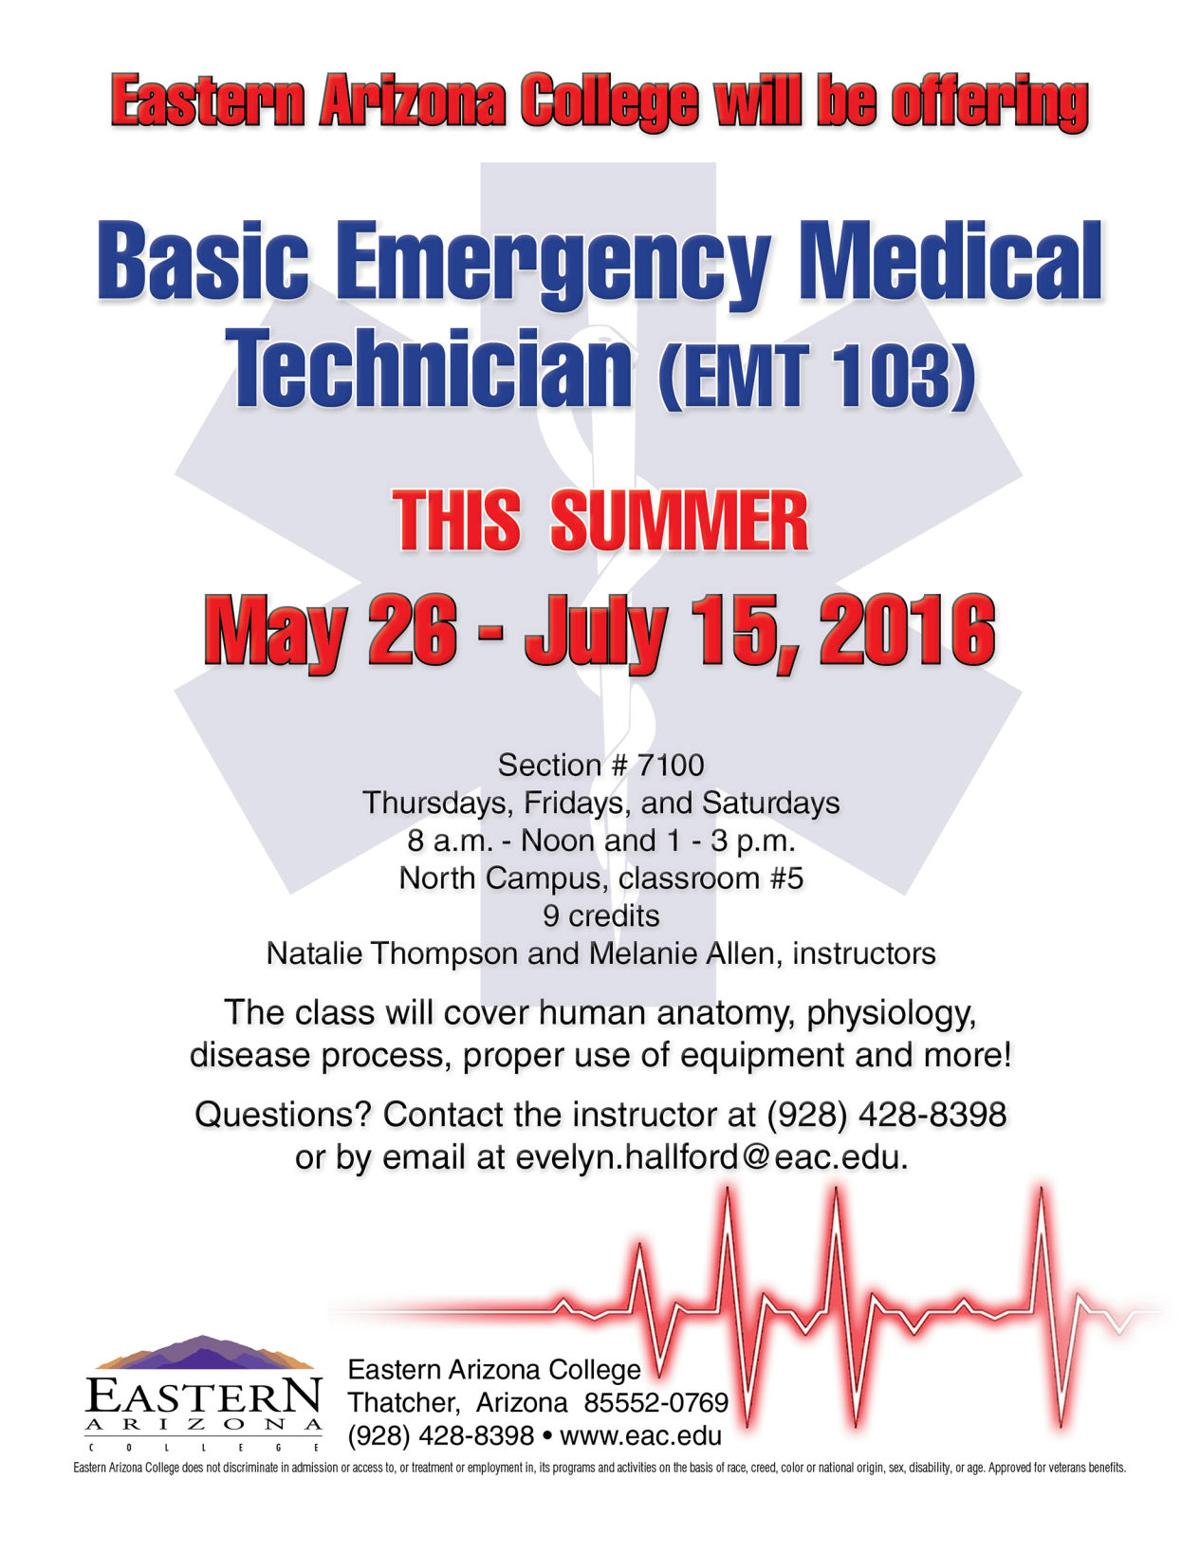 EAC offering EMT summer class | Local News Stories | eacourier.com